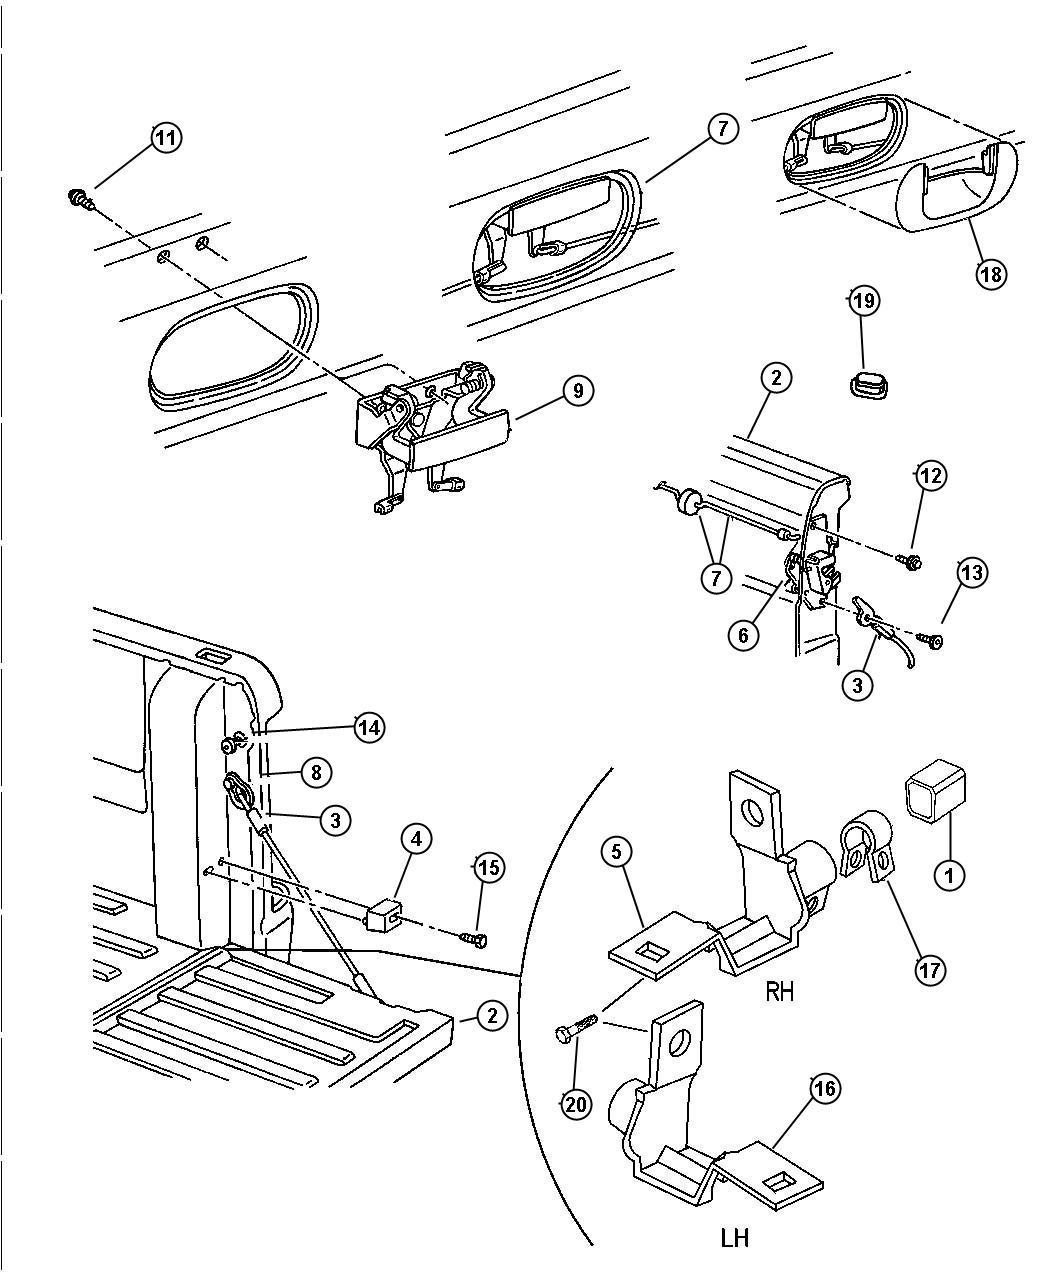 Dodge Ram Screw 312 18x3 00 Screw Tailgate